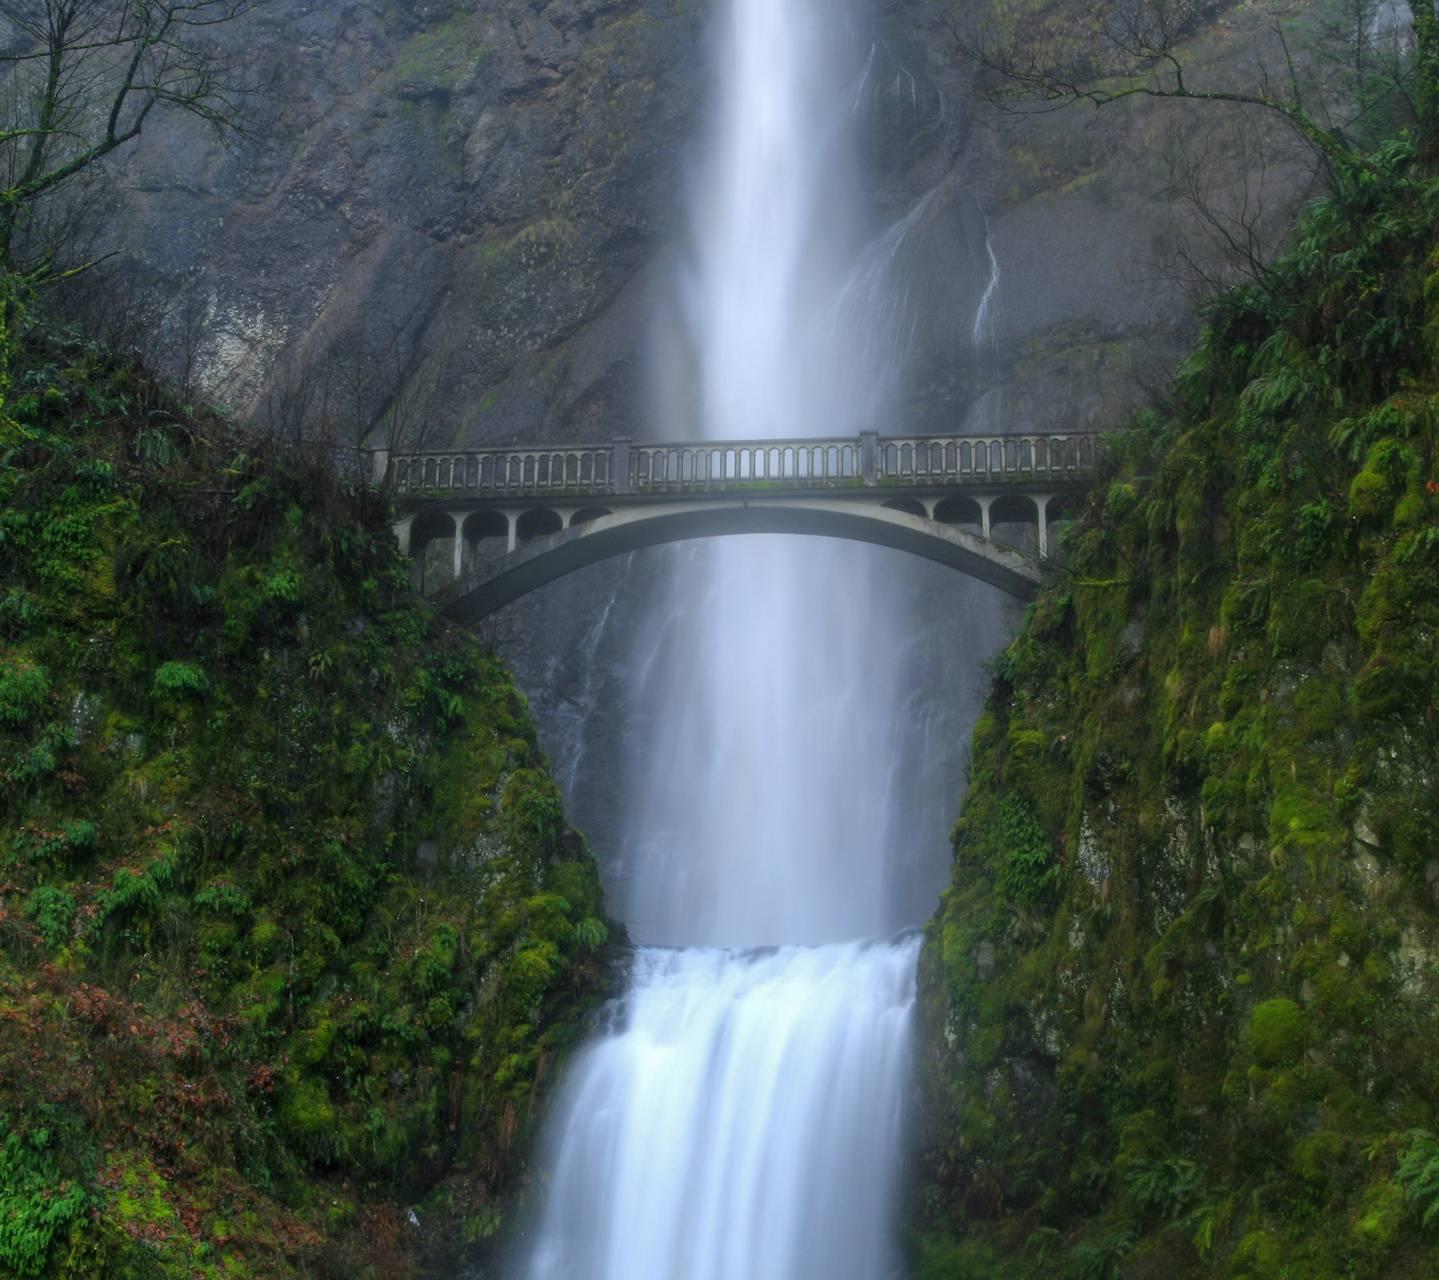 Bridge And Fall